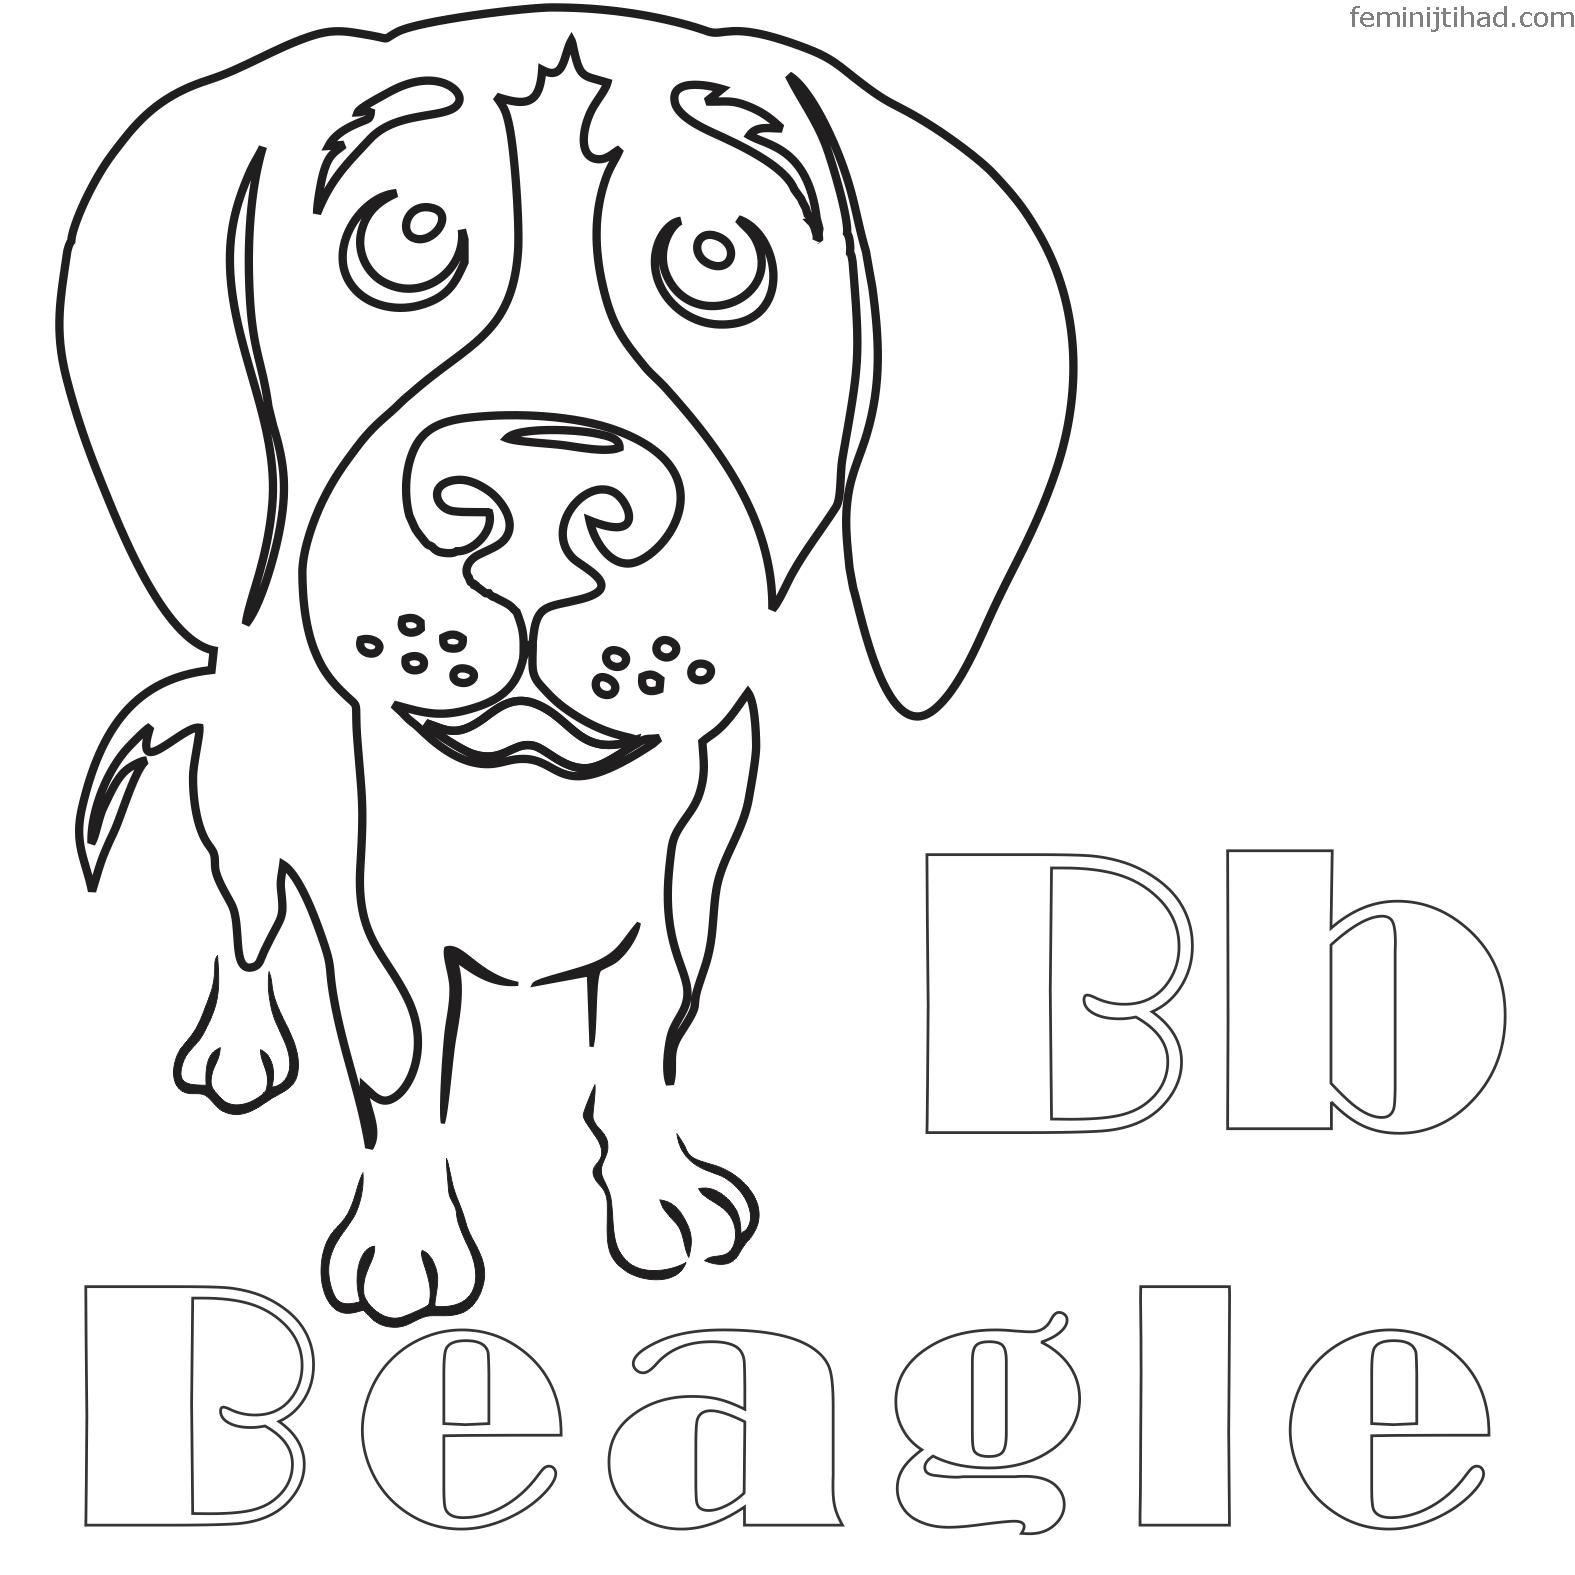 beagle coloring pages beagle dog coloring pages páginas para colorear dibujos coloring beagle pages